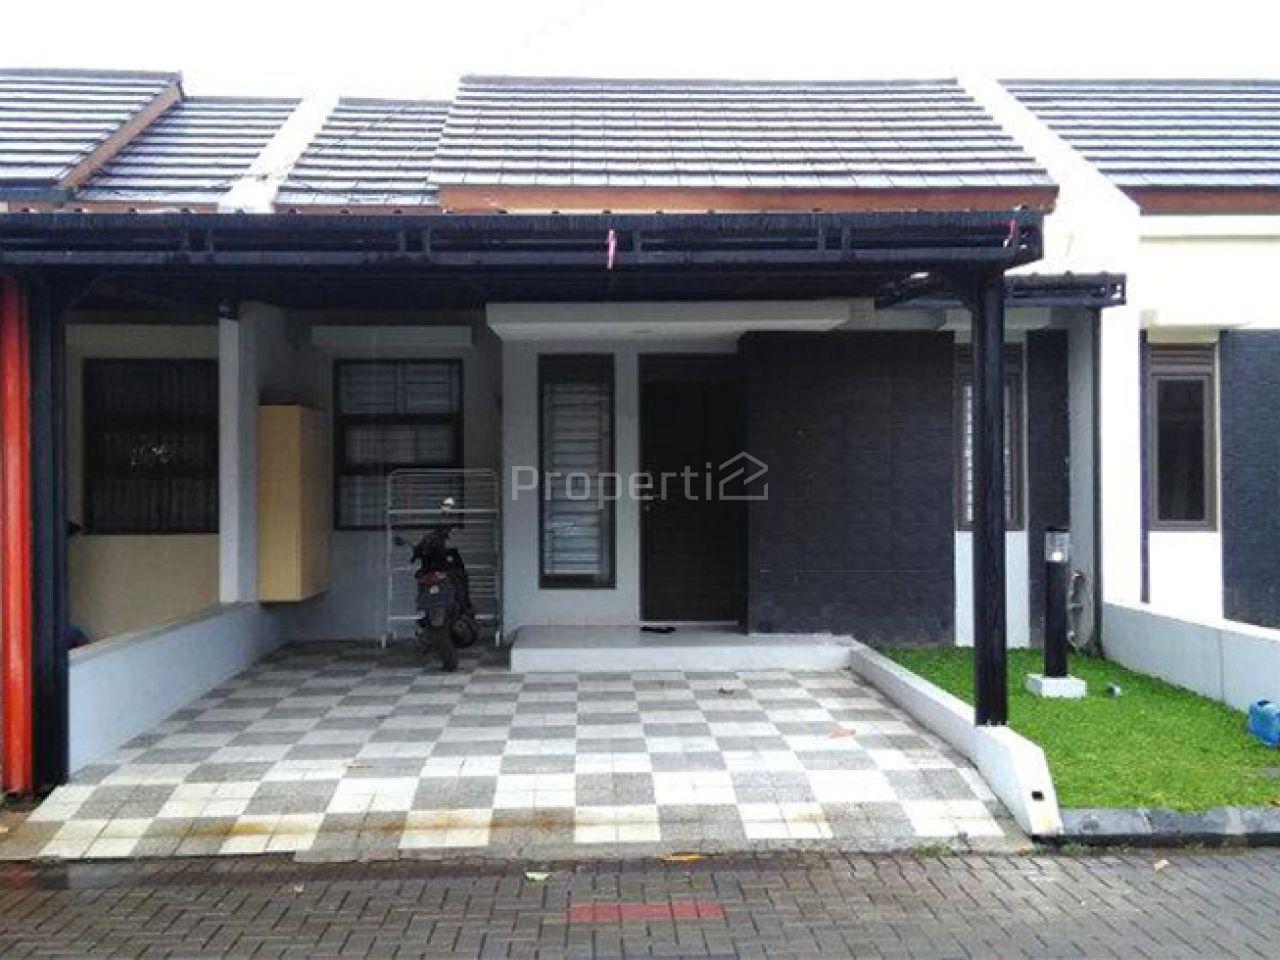 New House in Bandung City, Jawa Barat